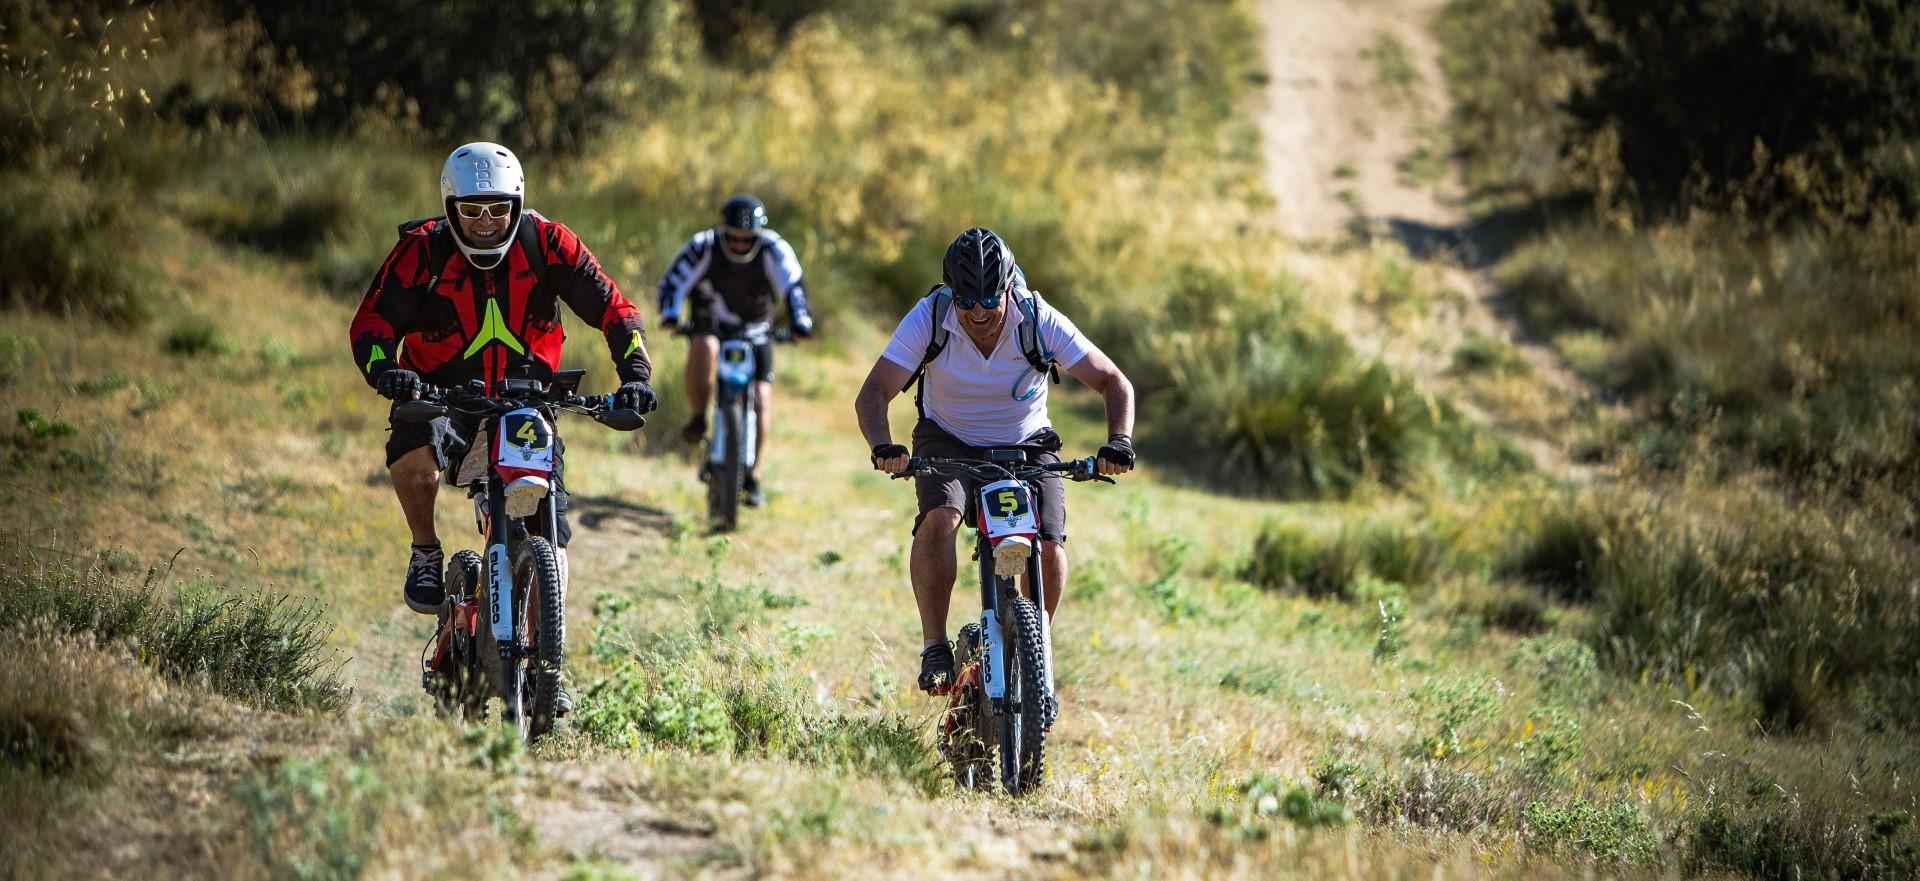 Bultaco Brinco Endurance, primera edición